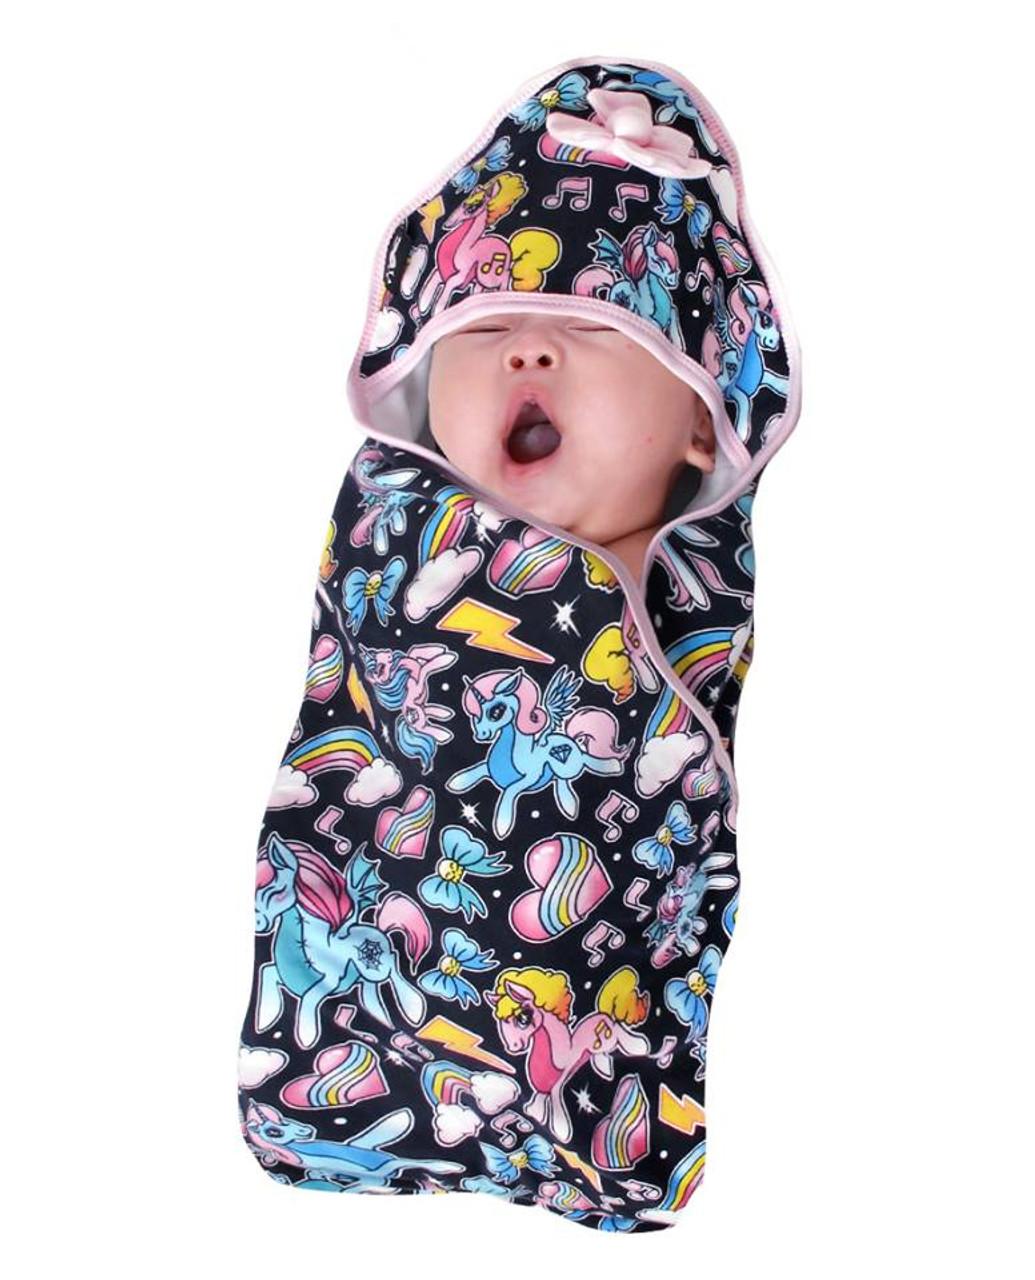 Six Bunnies Unicorns Baby Wrap Blanket Hooded Towel Wrap